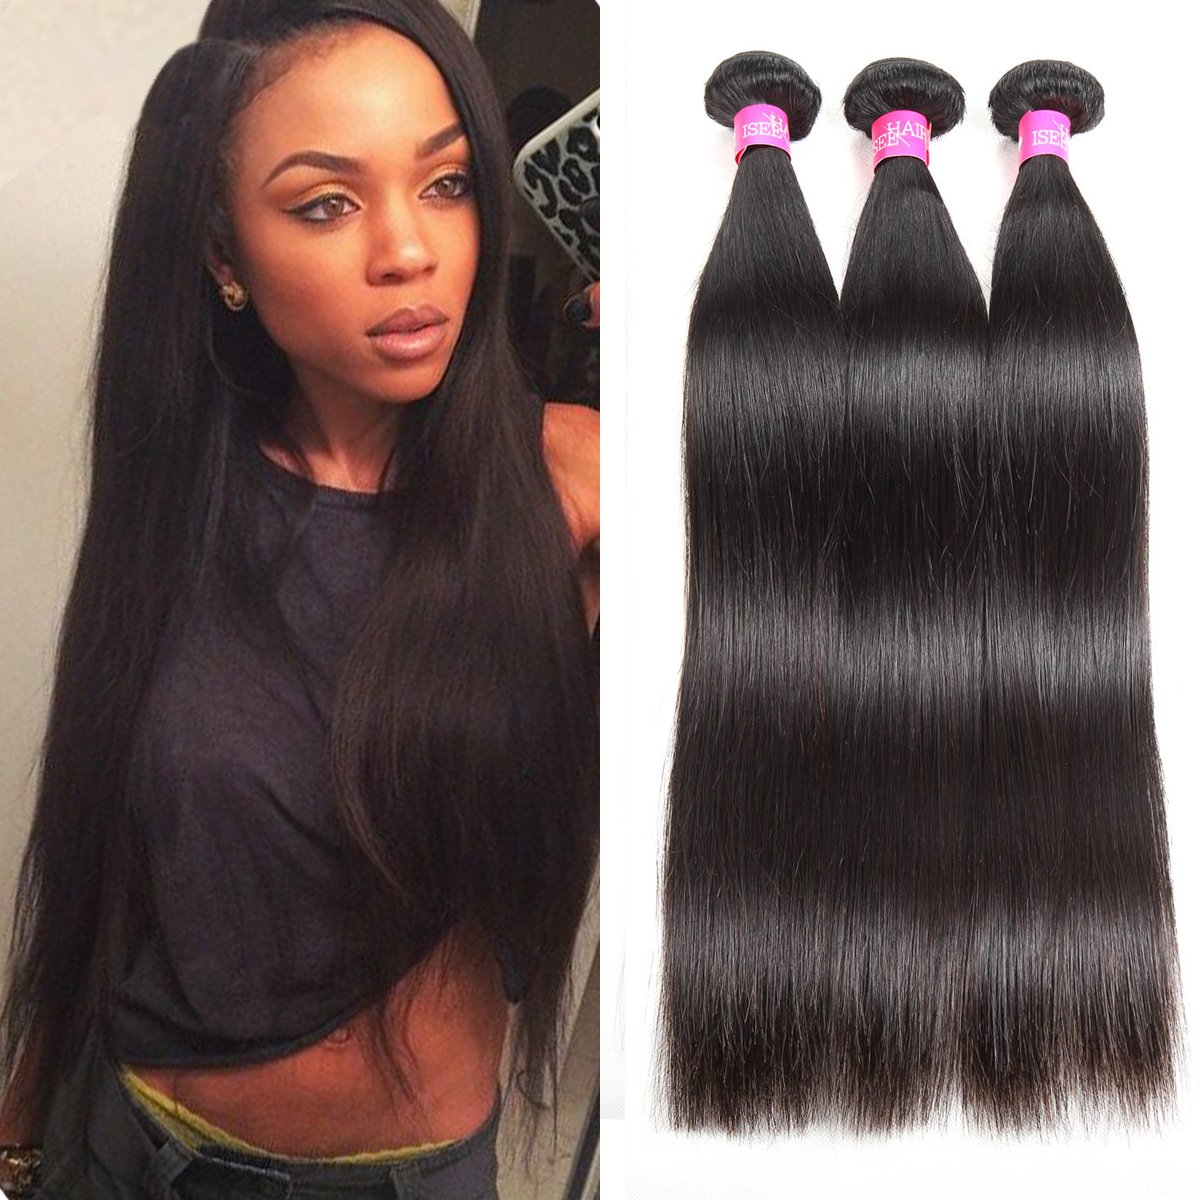 ISEE Hair 8A Malaysian Virgin Straight Hair 3 Bundles 100% Unprocessed Human Hair Weave Bundles Human Hair Extensions 3 Bundles Deal Natural Black 18inches by ISEE